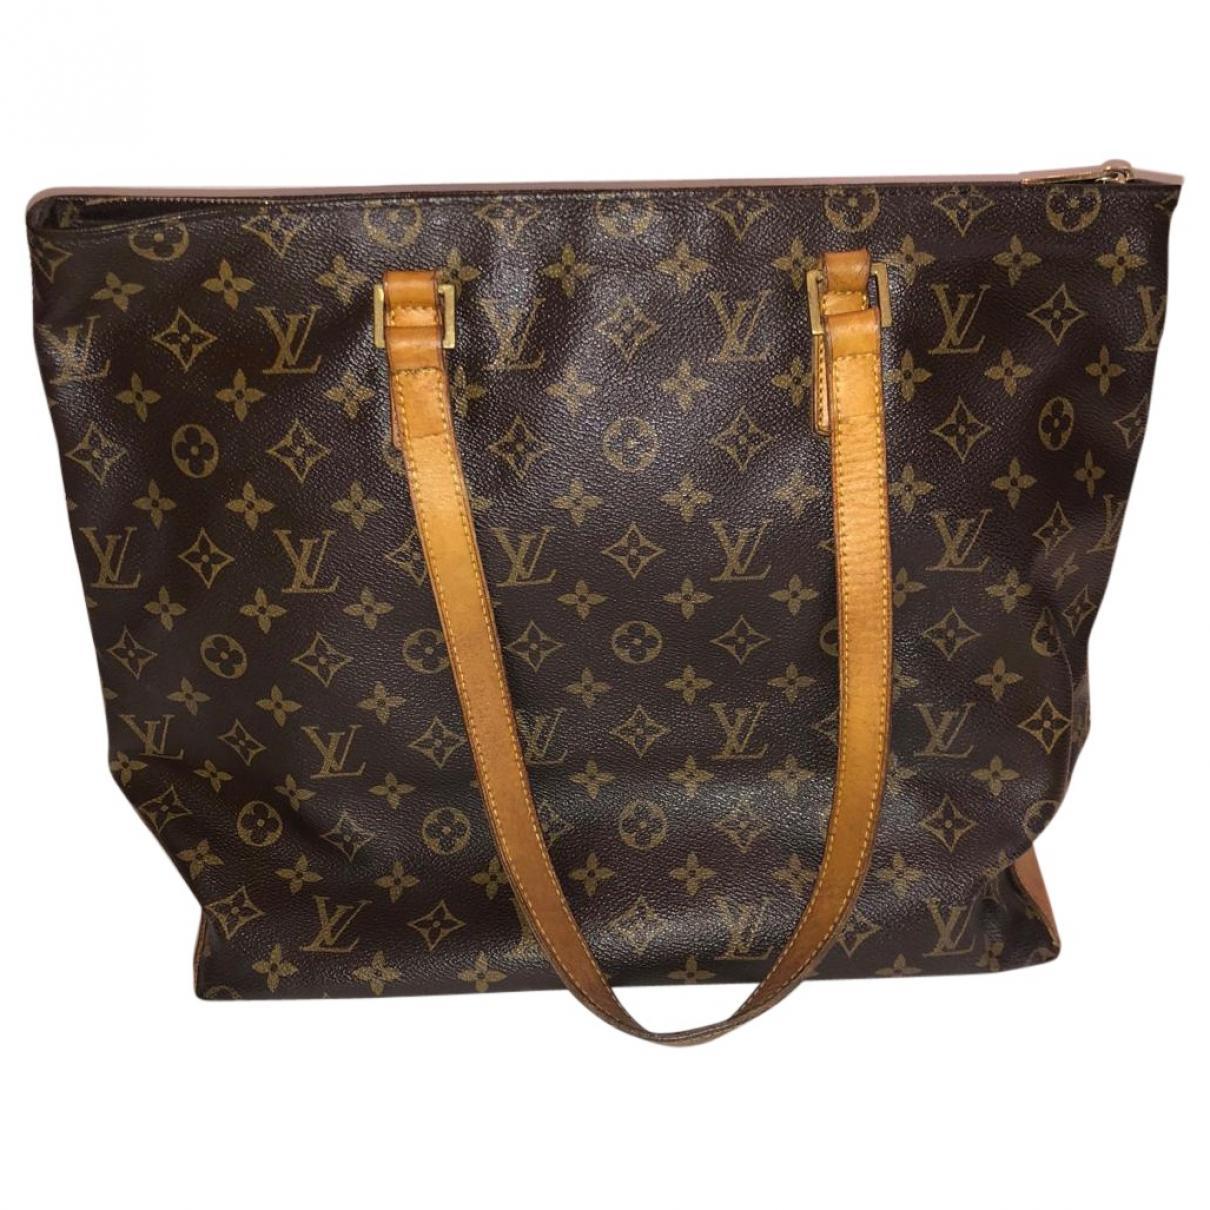 c8a14867dba9 Louis Vuitton. Women's Cloth Bag. £490 From Vestiaire Collective